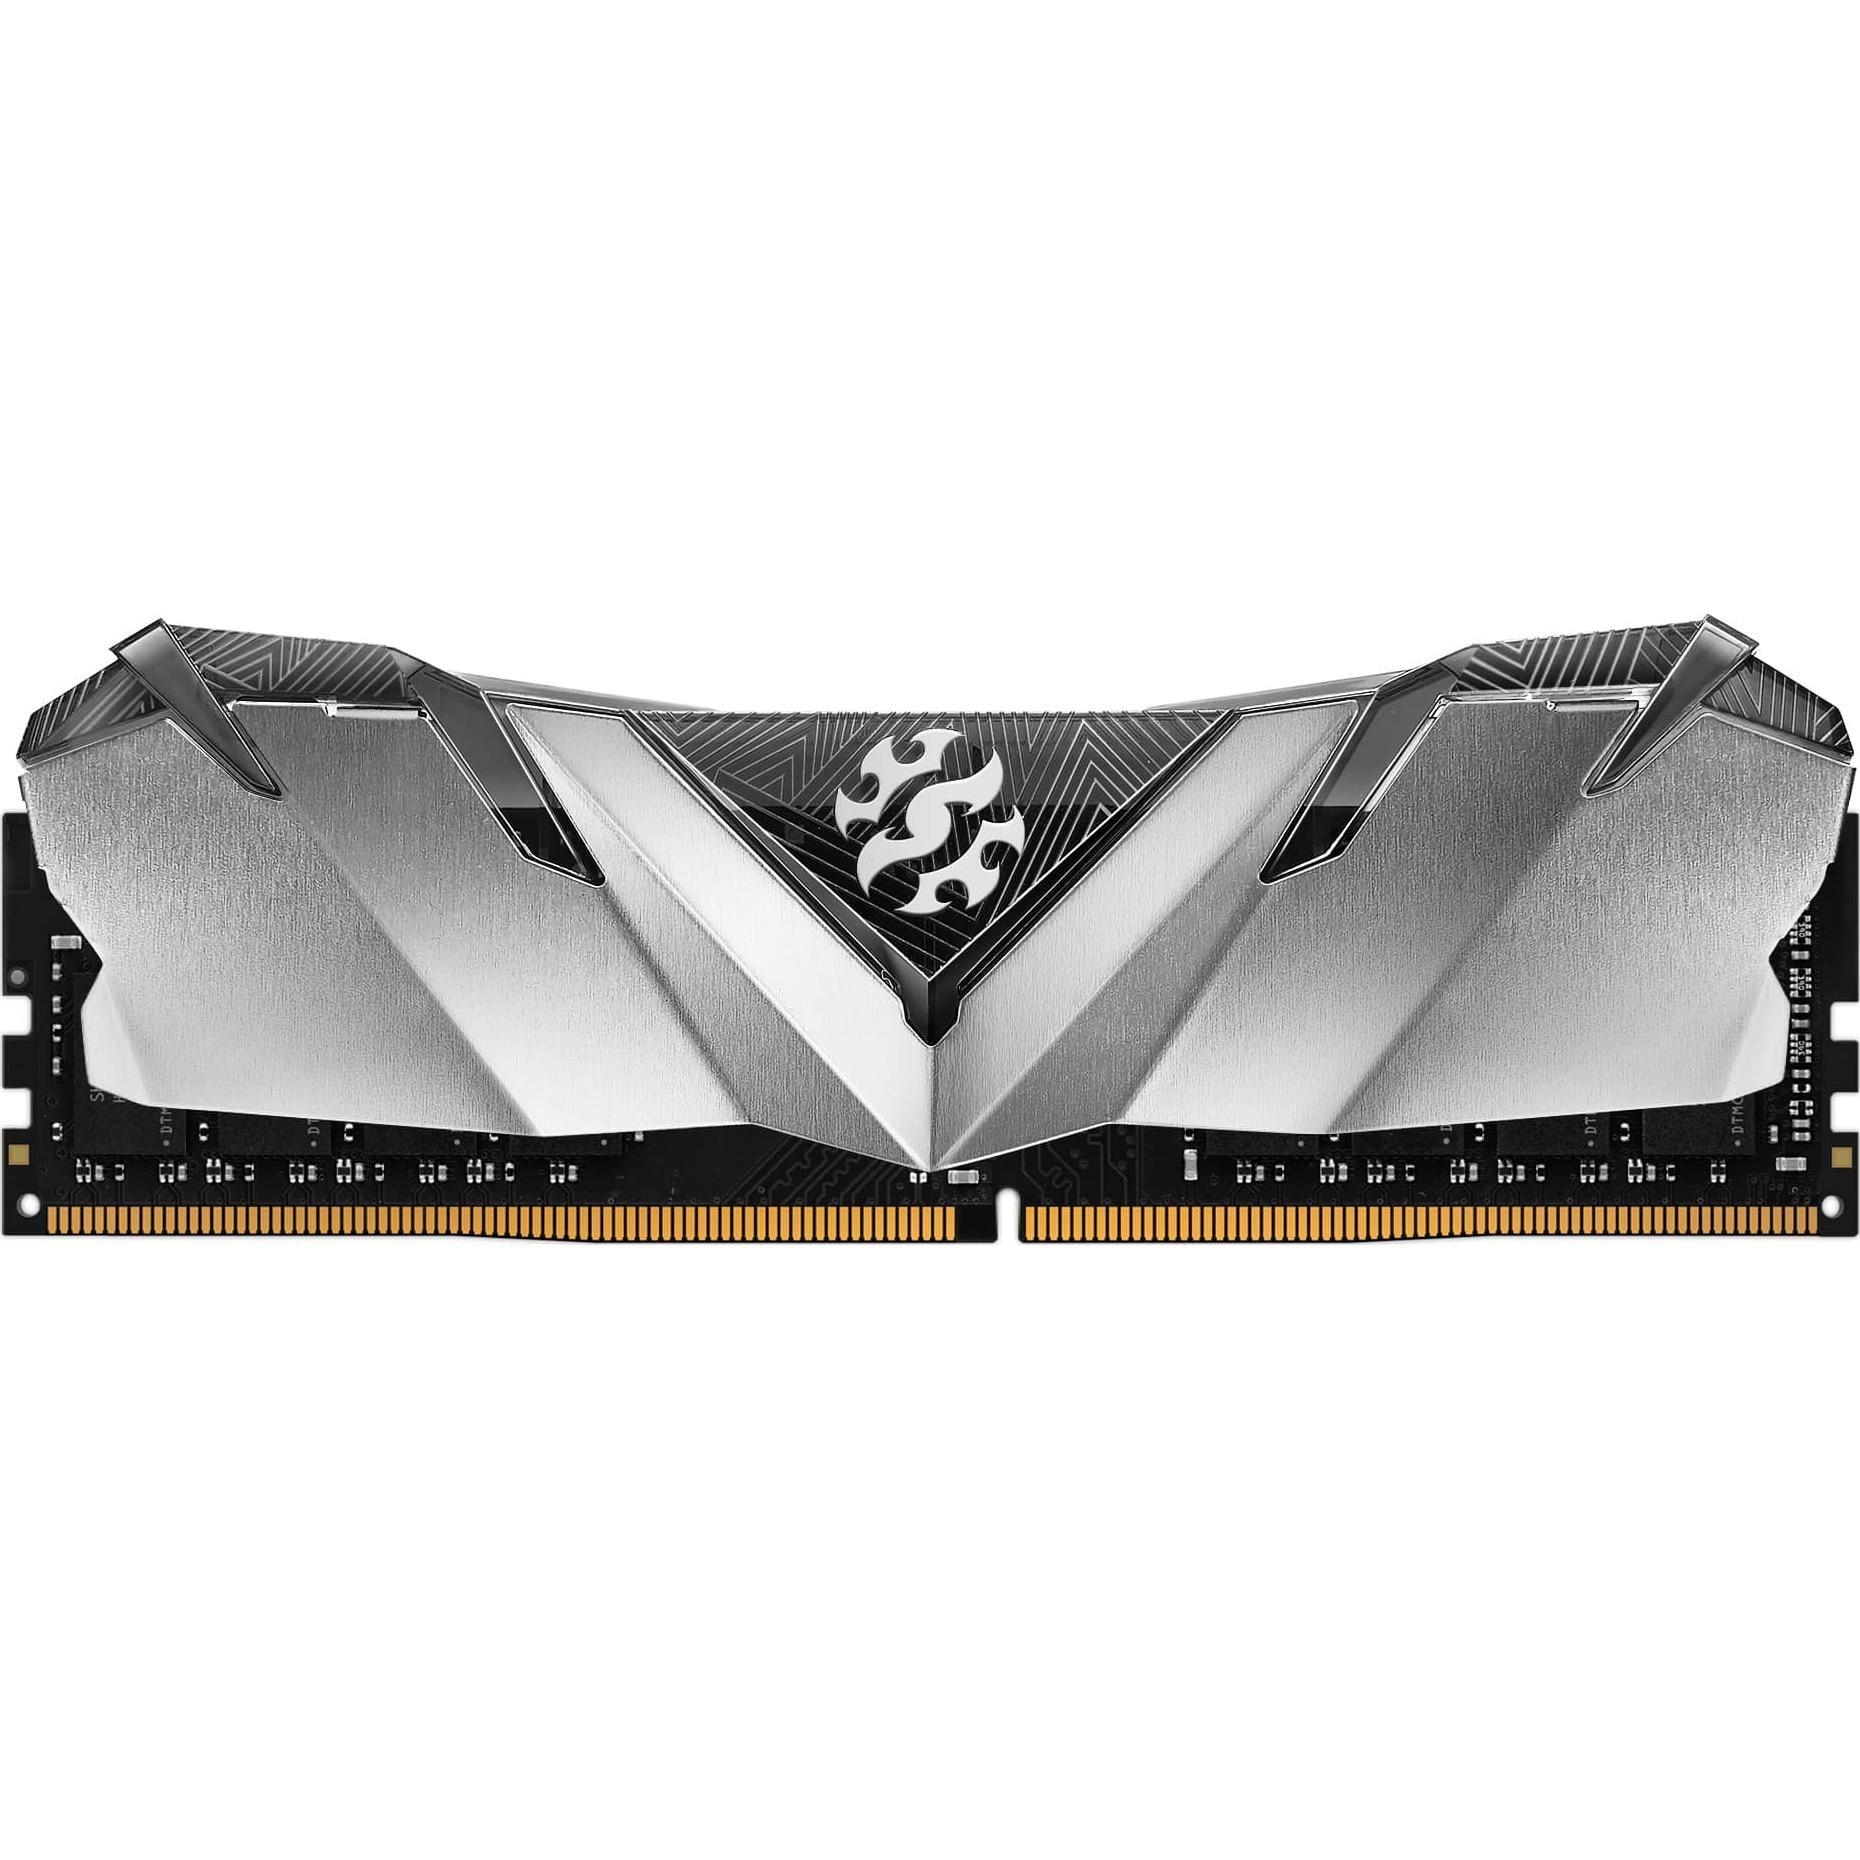 Fotografie Memorie ADATA XPG Gammix D30, 8GB, DDR4, 3200MHz, CL16